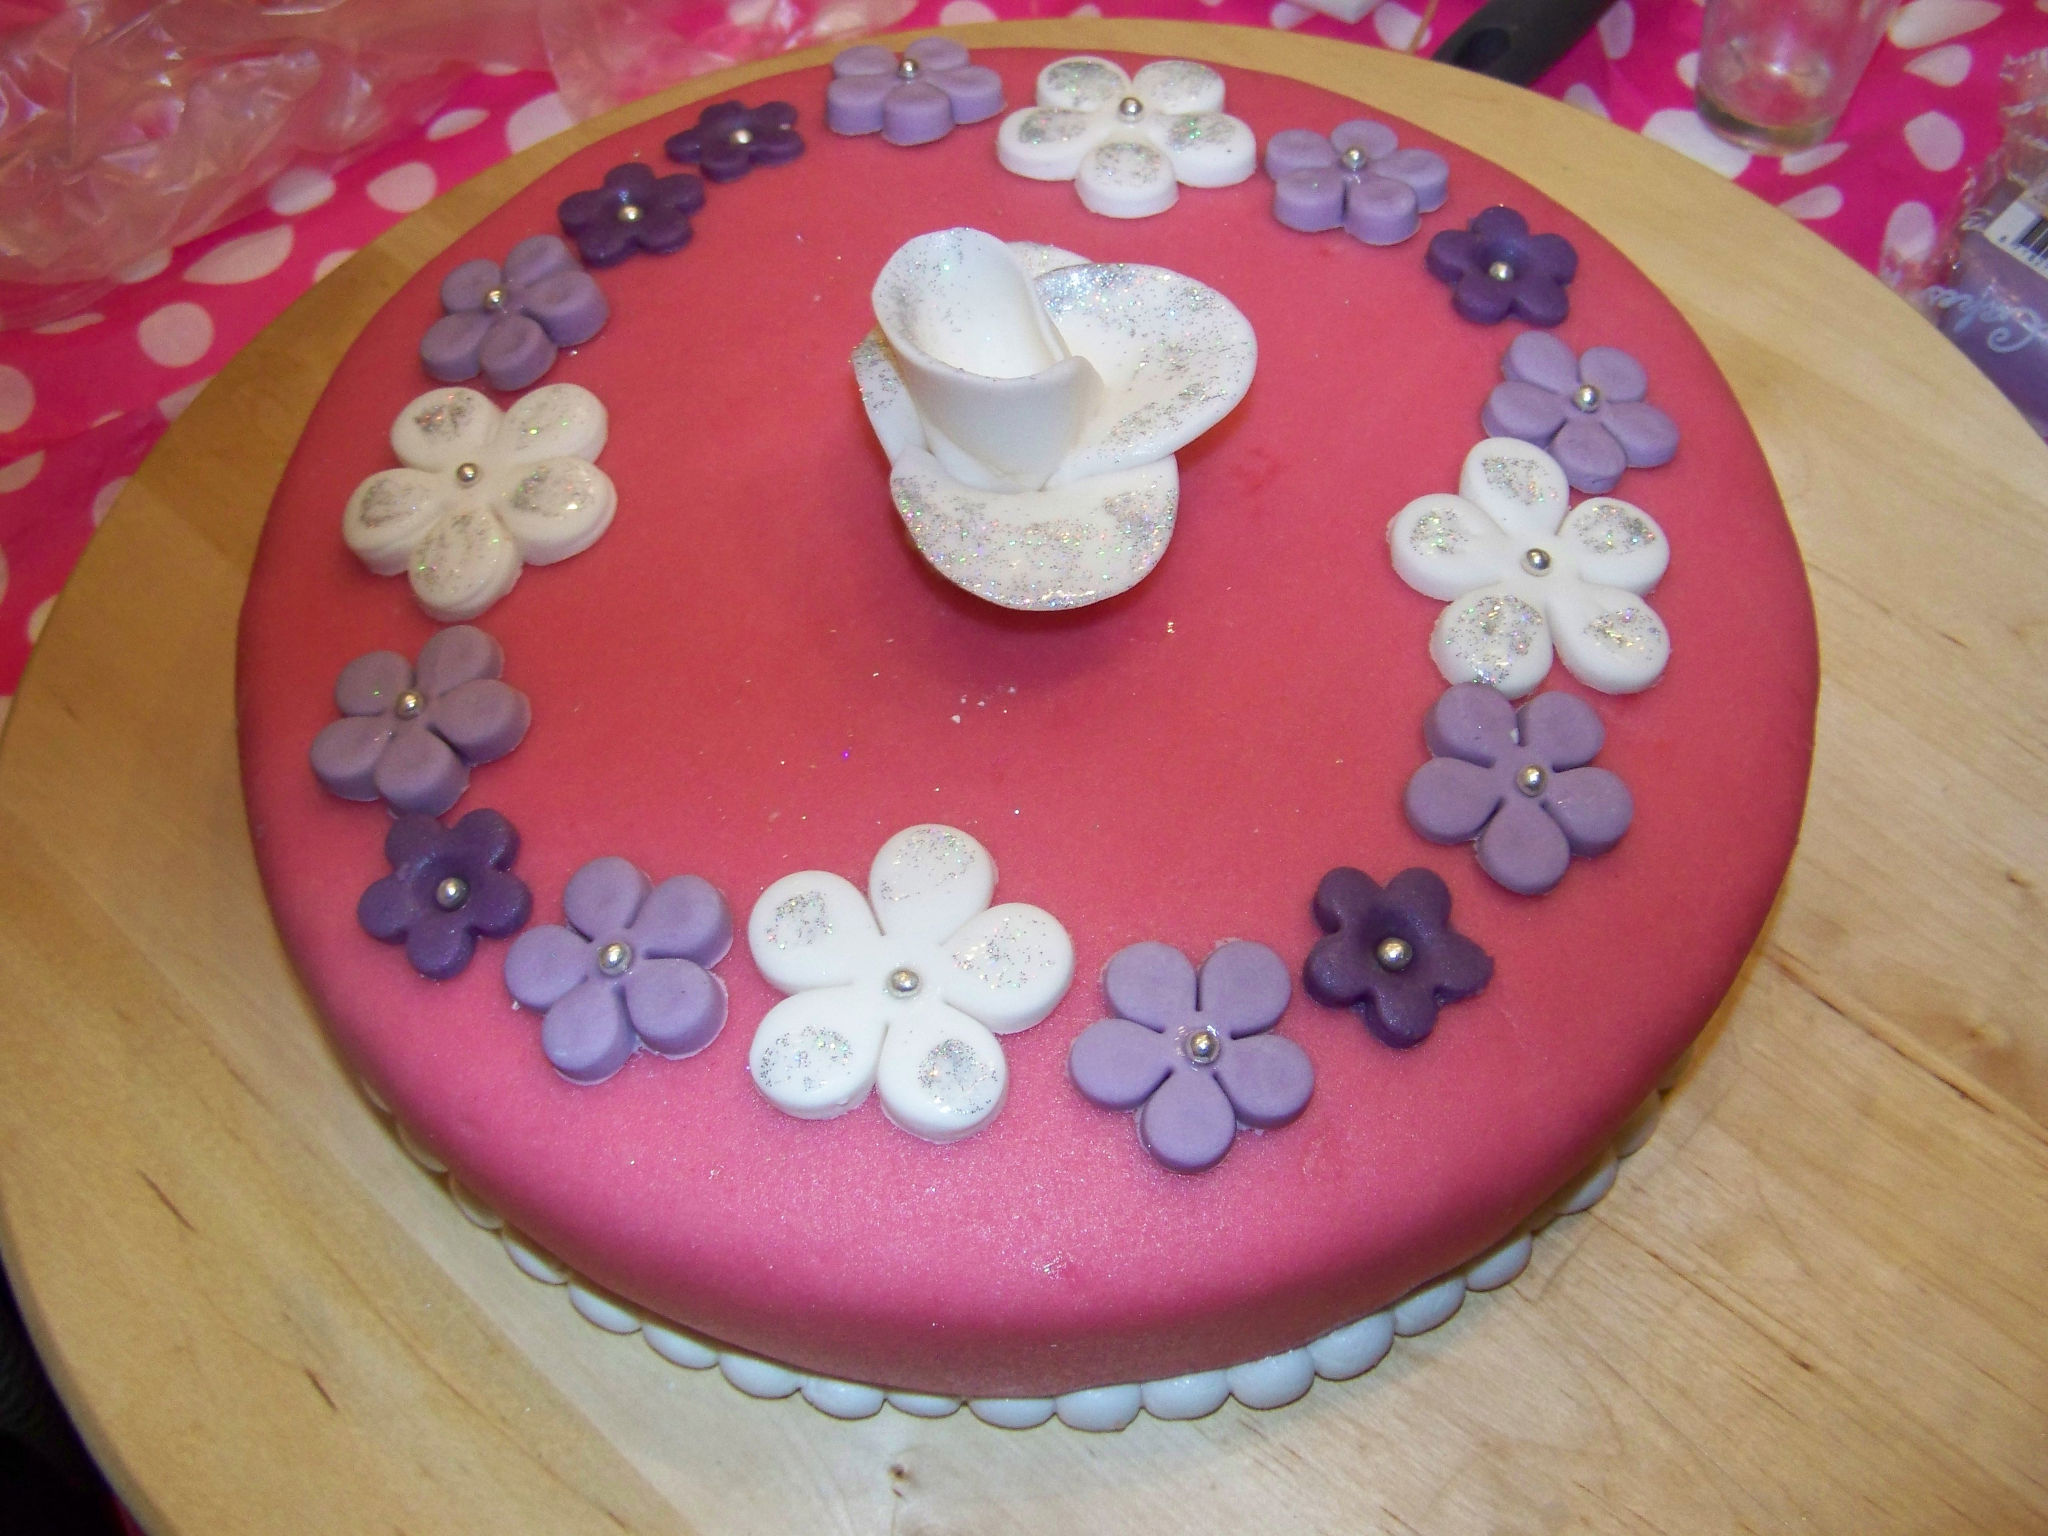 cake versieren met cake ideas and designs. Black Bedroom Furniture Sets. Home Design Ideas